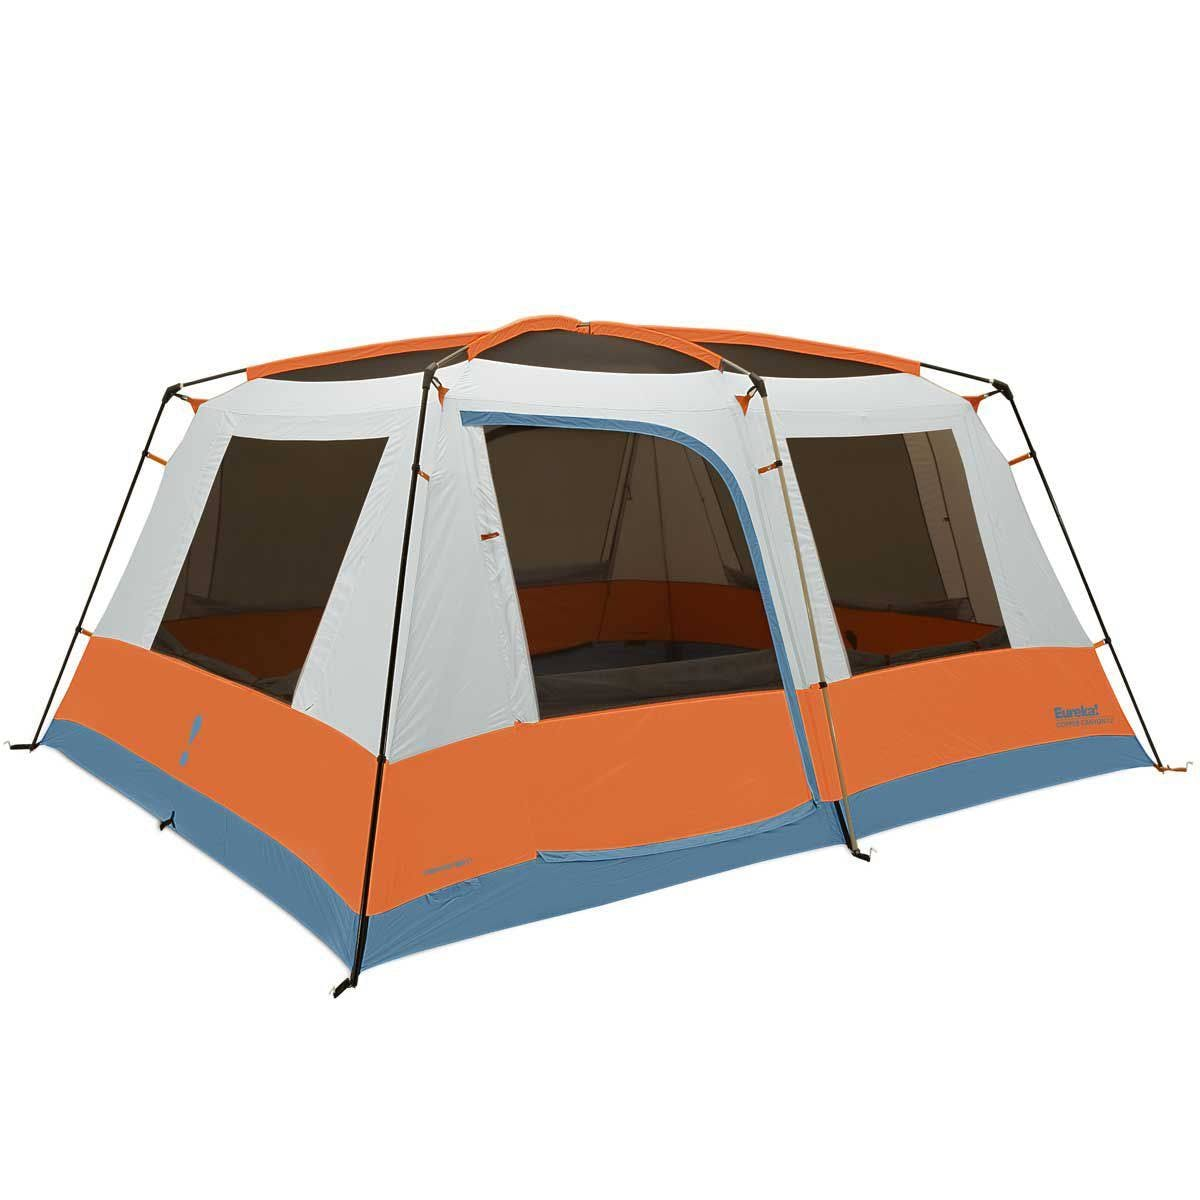 Eureka Copper Canyon LX 12 Person Tent